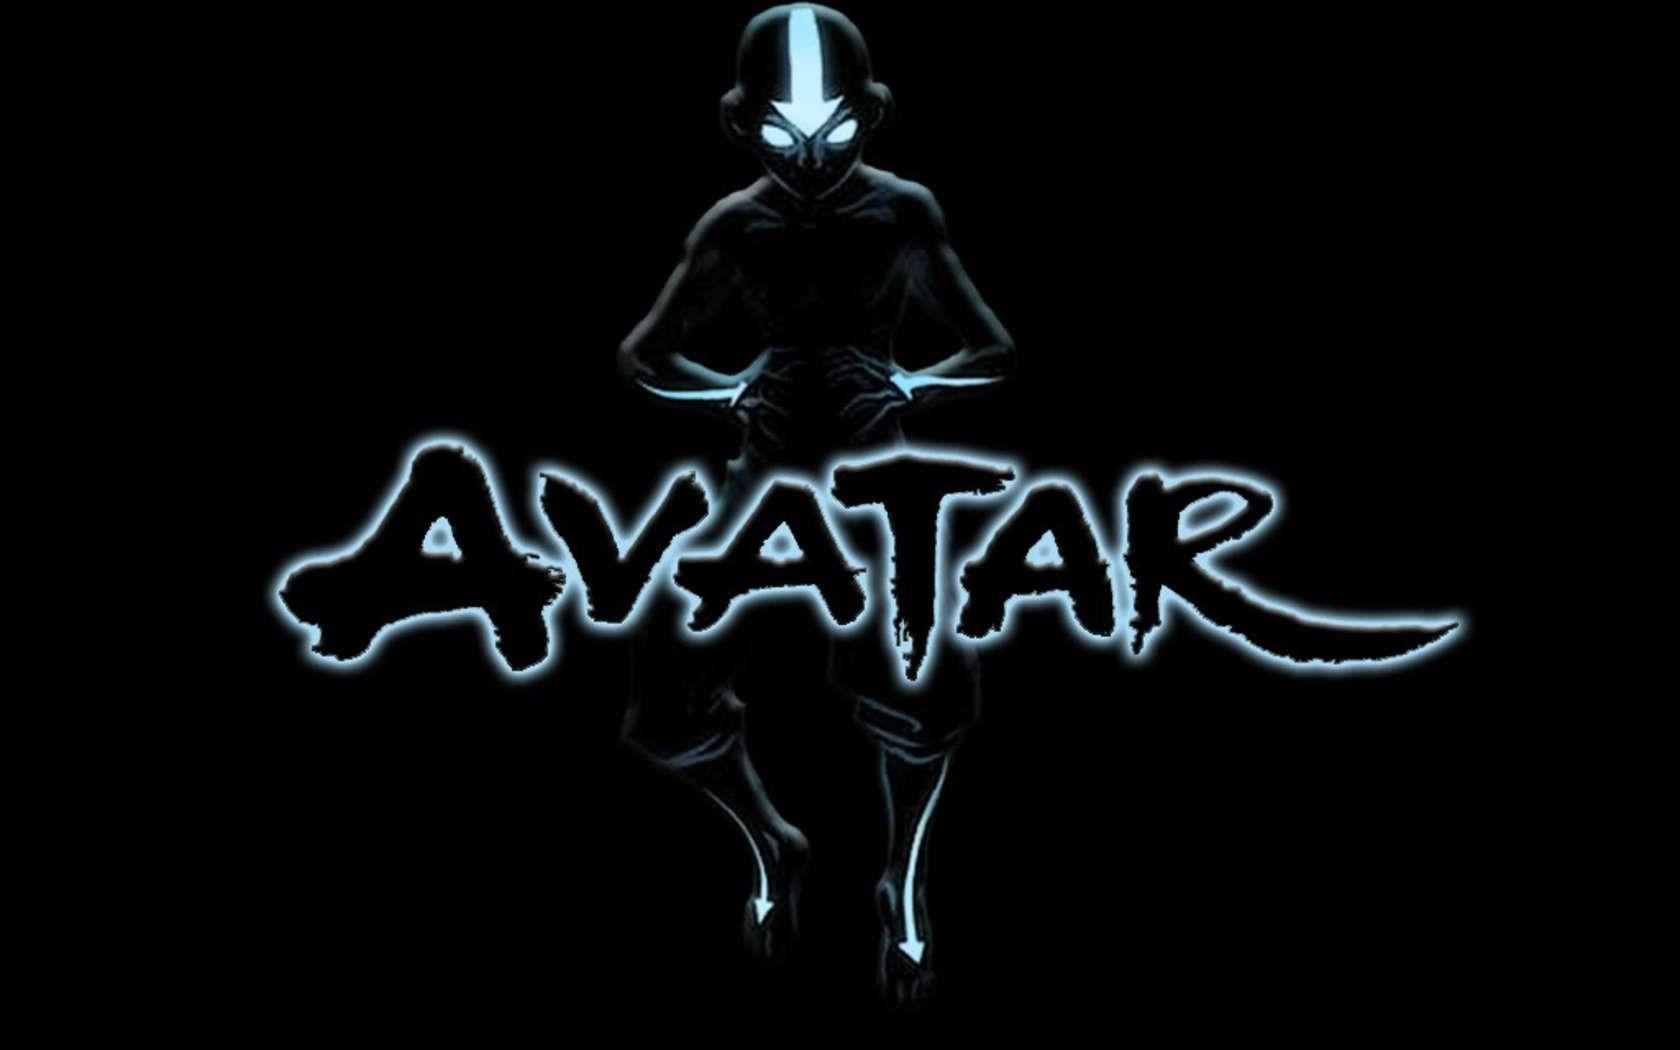 Avatar Aang Wallpapers - Wallpaper Cave